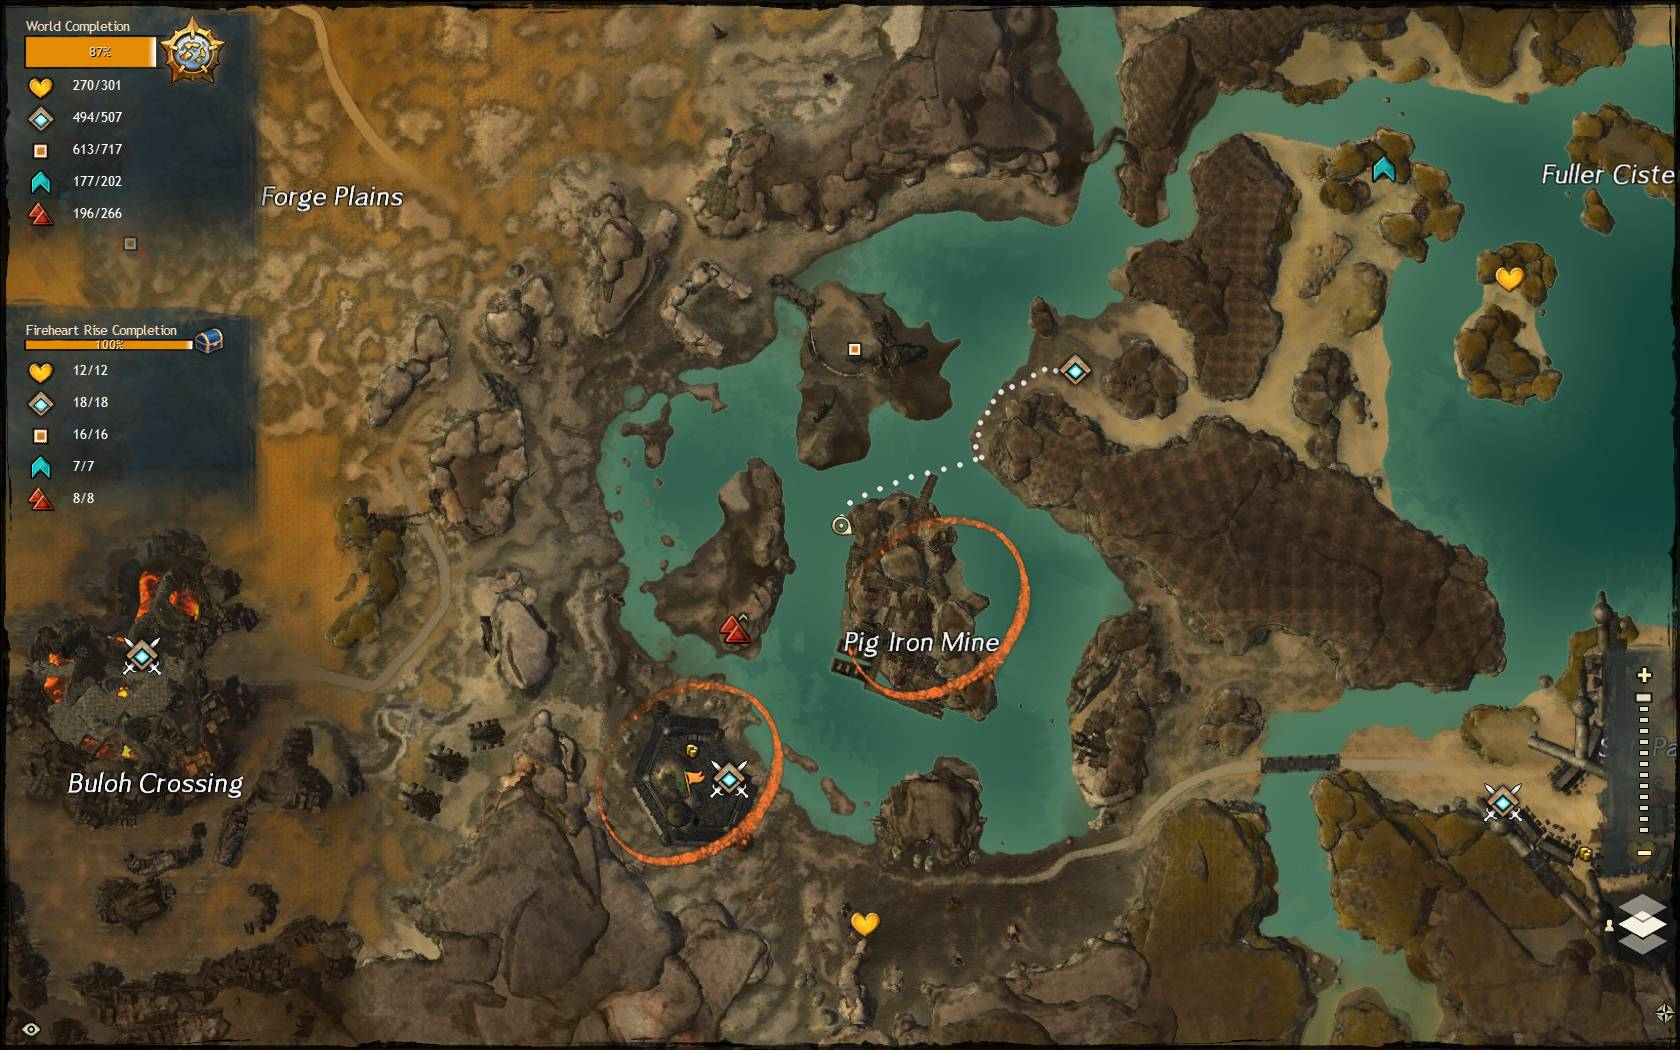 Pig Iron Quarry Jumping Puzzle